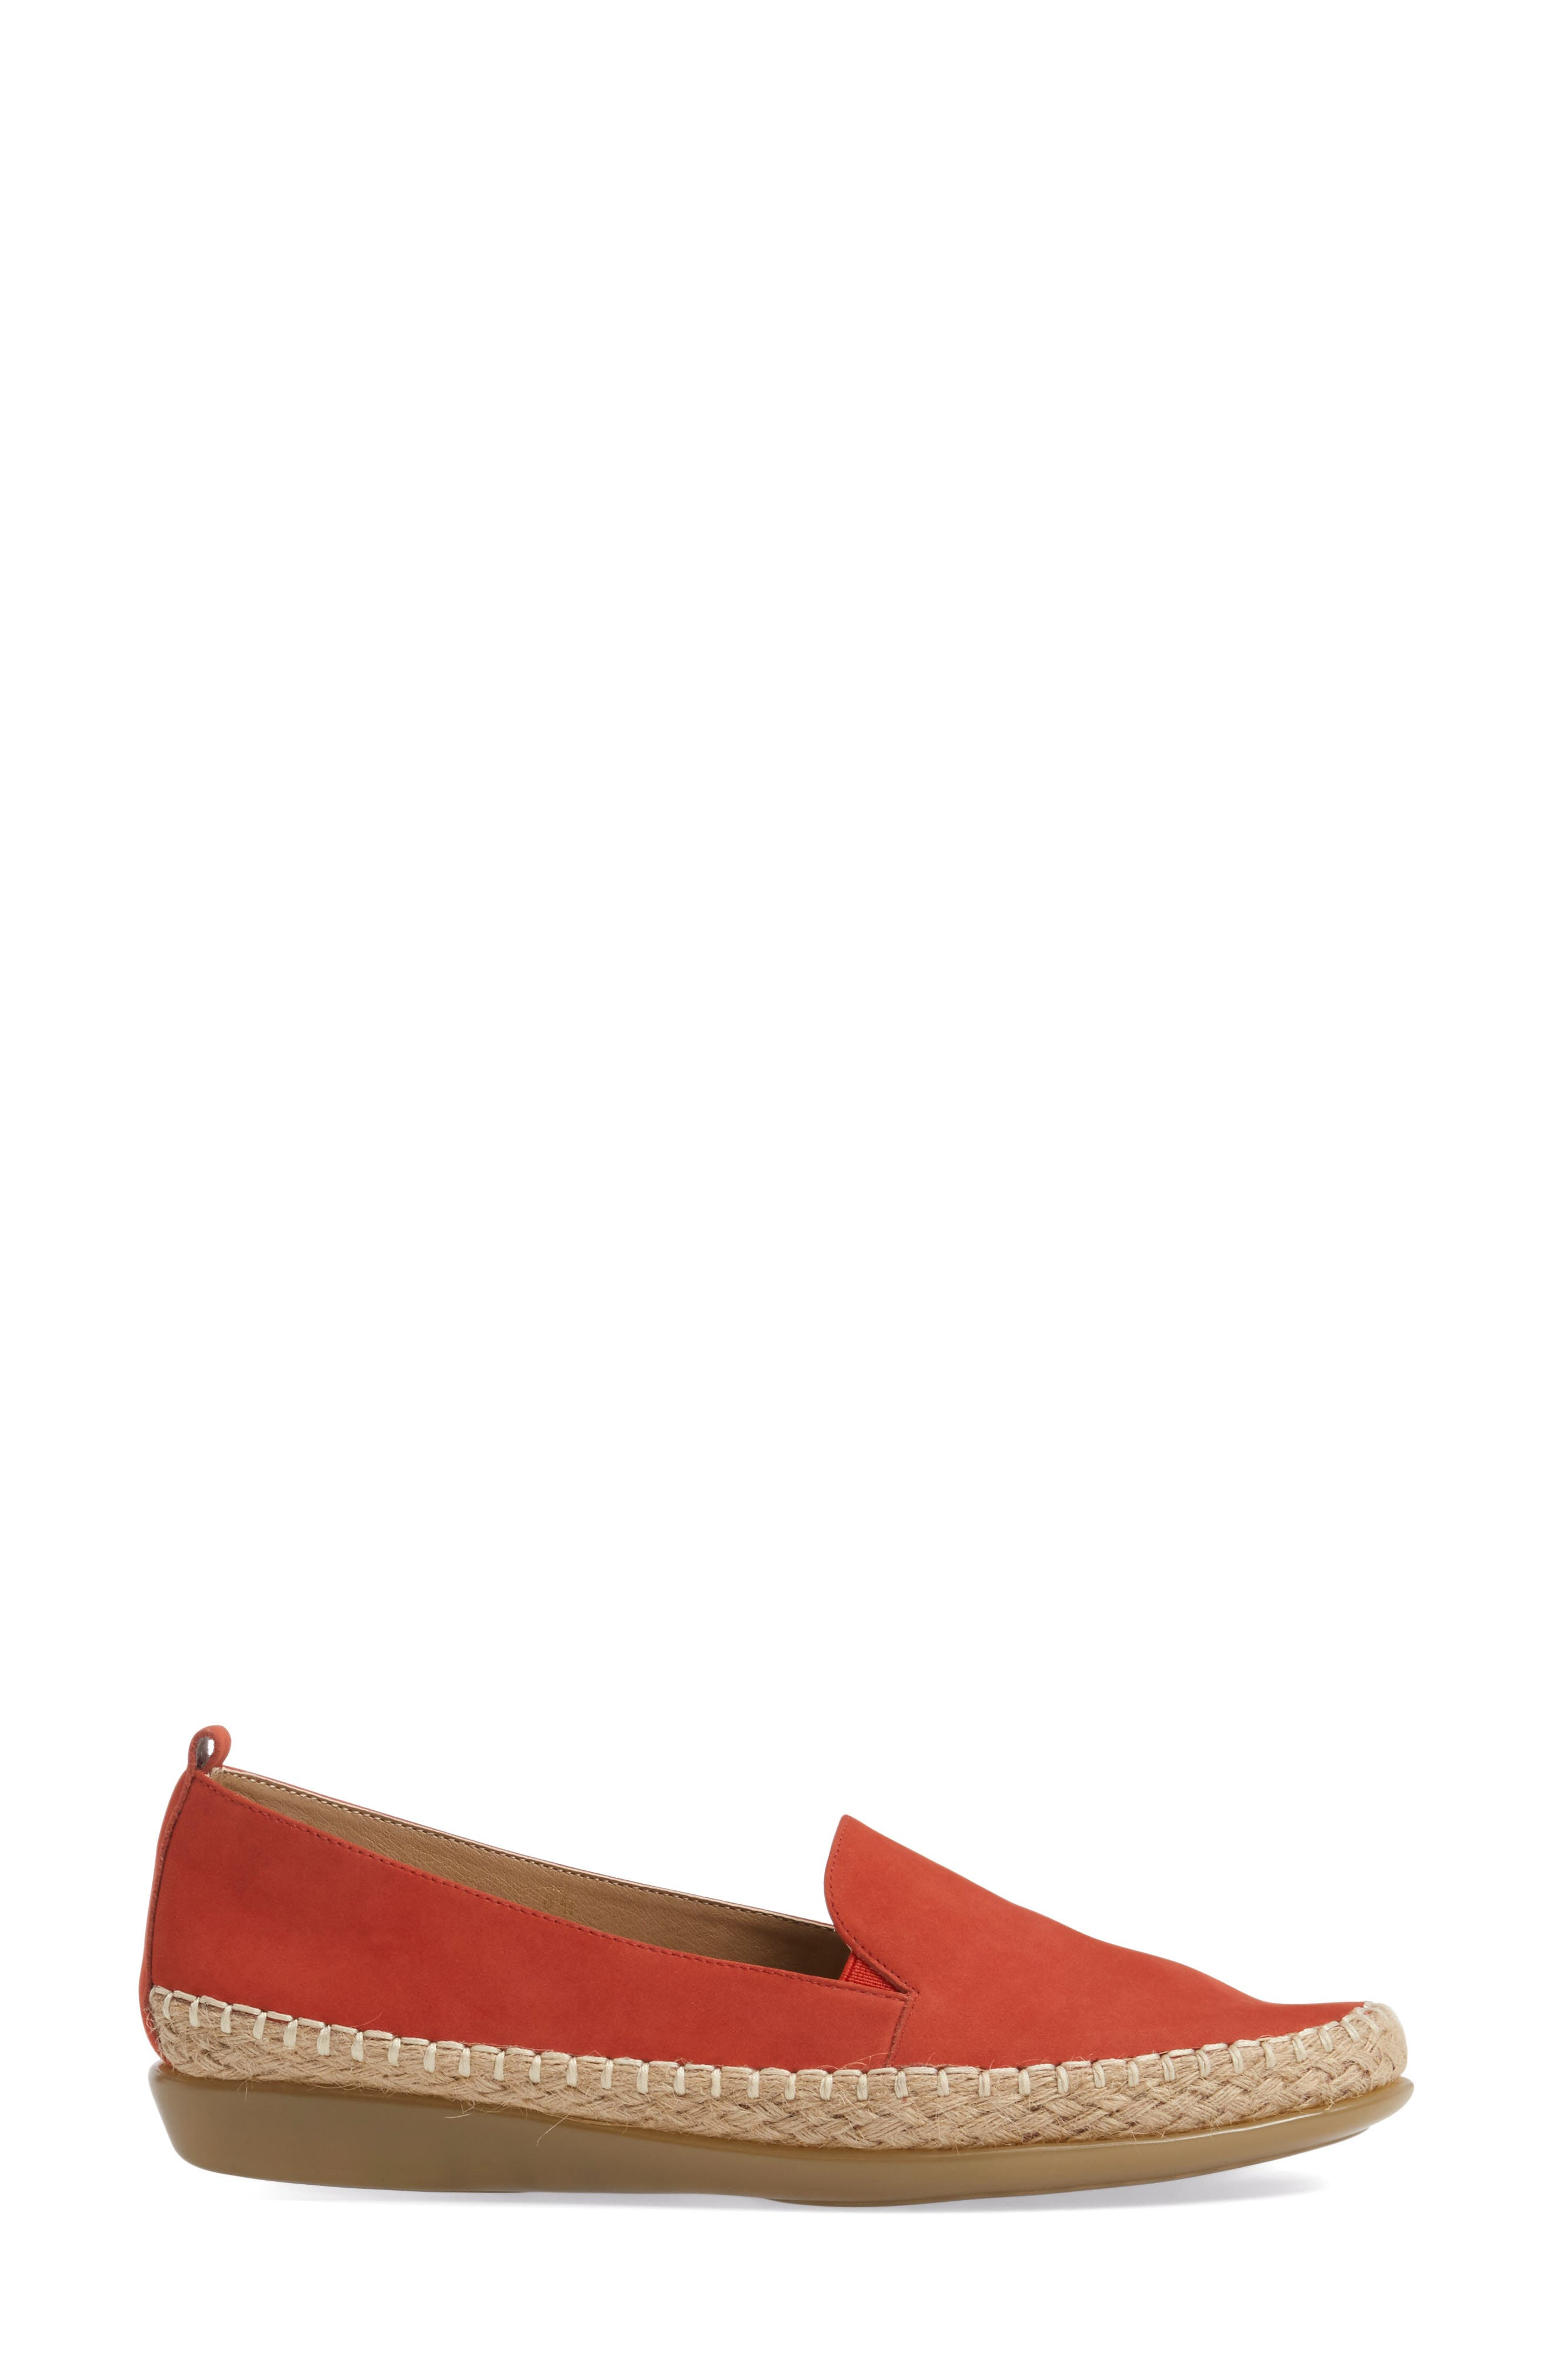 Nadette Espadrille Loafer Flat,                             Alternate thumbnail 3, color,                             Red Leather